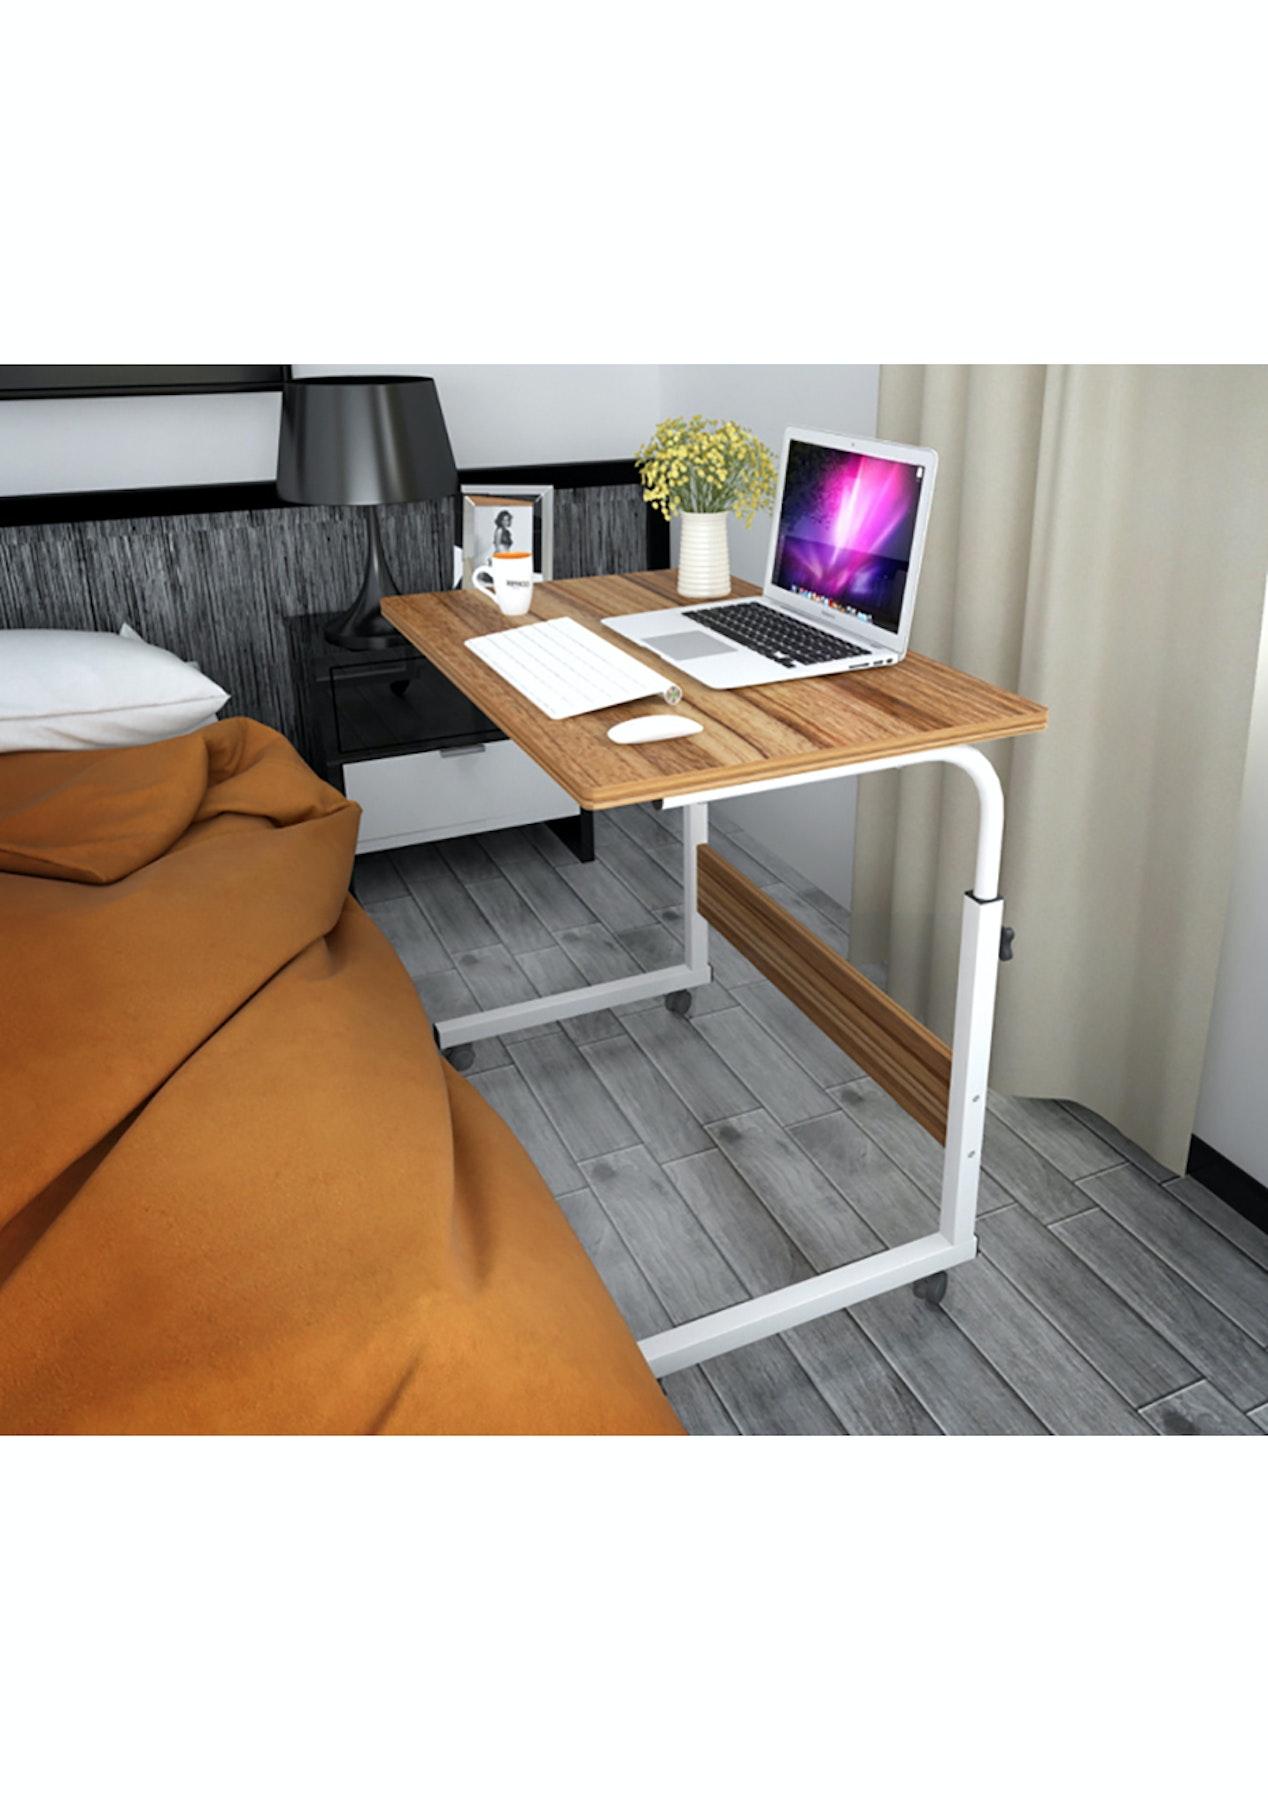 Adjustable Laptopcomputer Standing Portable Desk Under 100